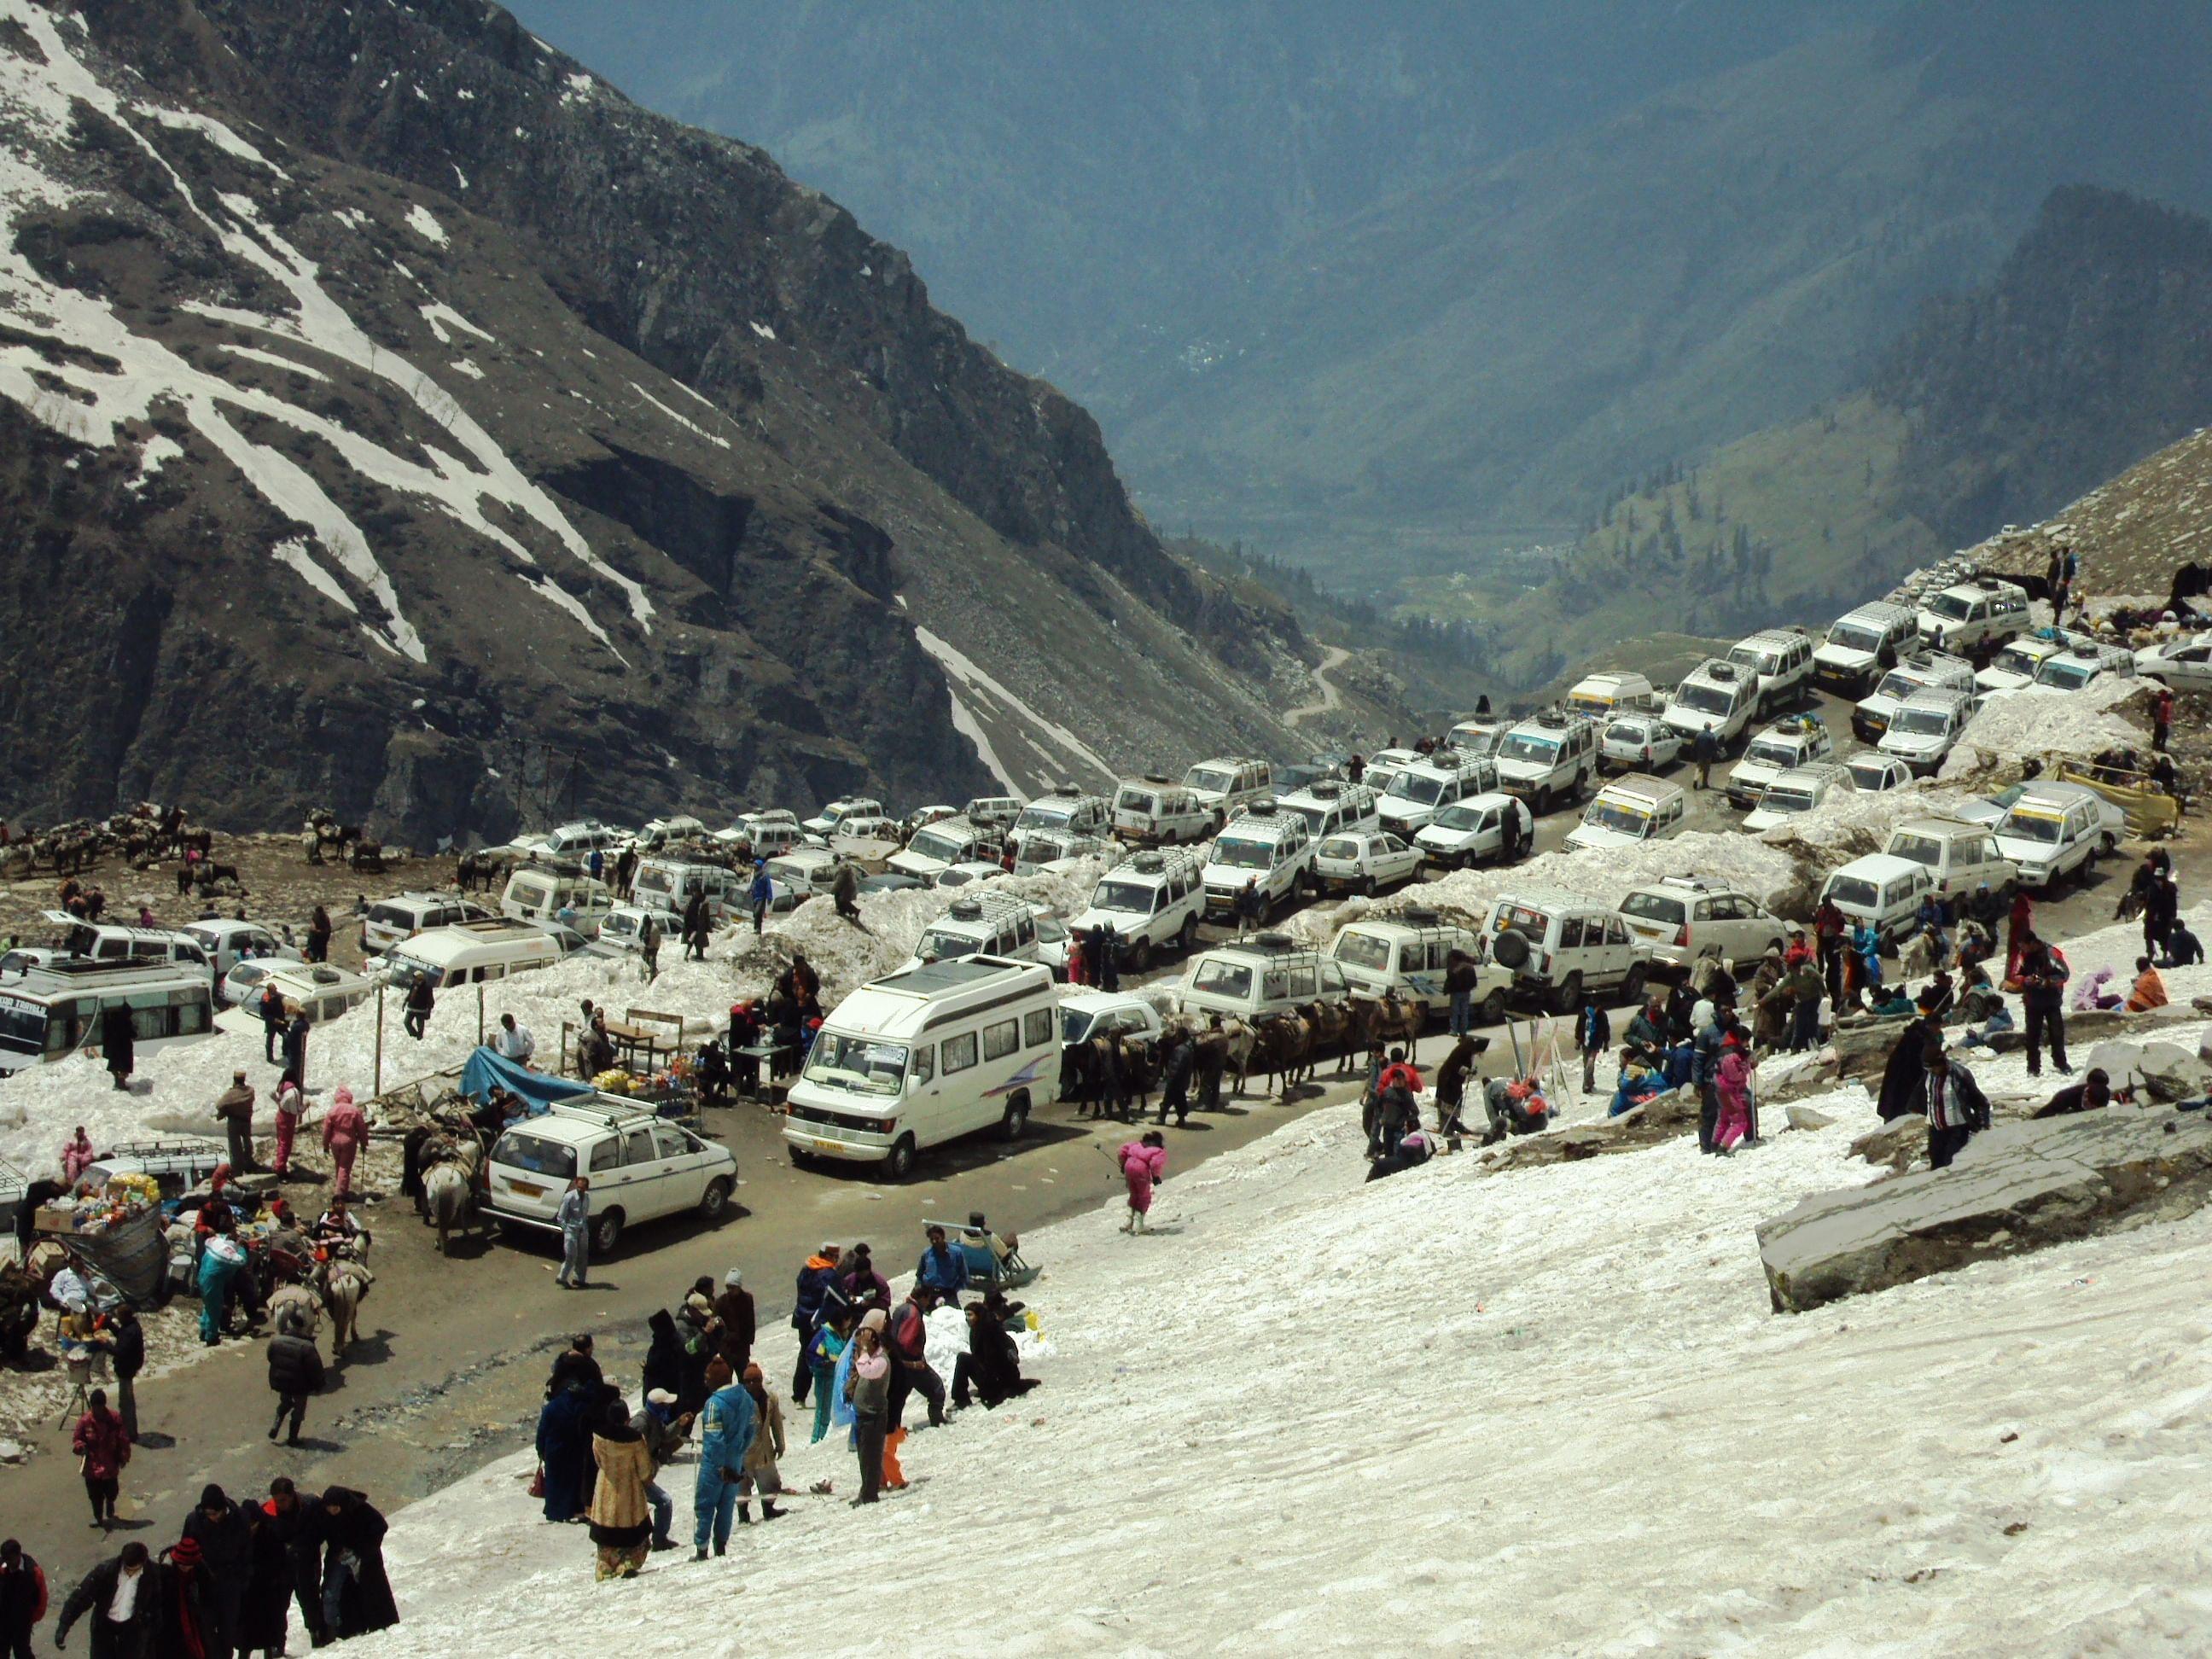 Tourist vehicles at Rohtang Pass (Source: Wikimedia Commons)